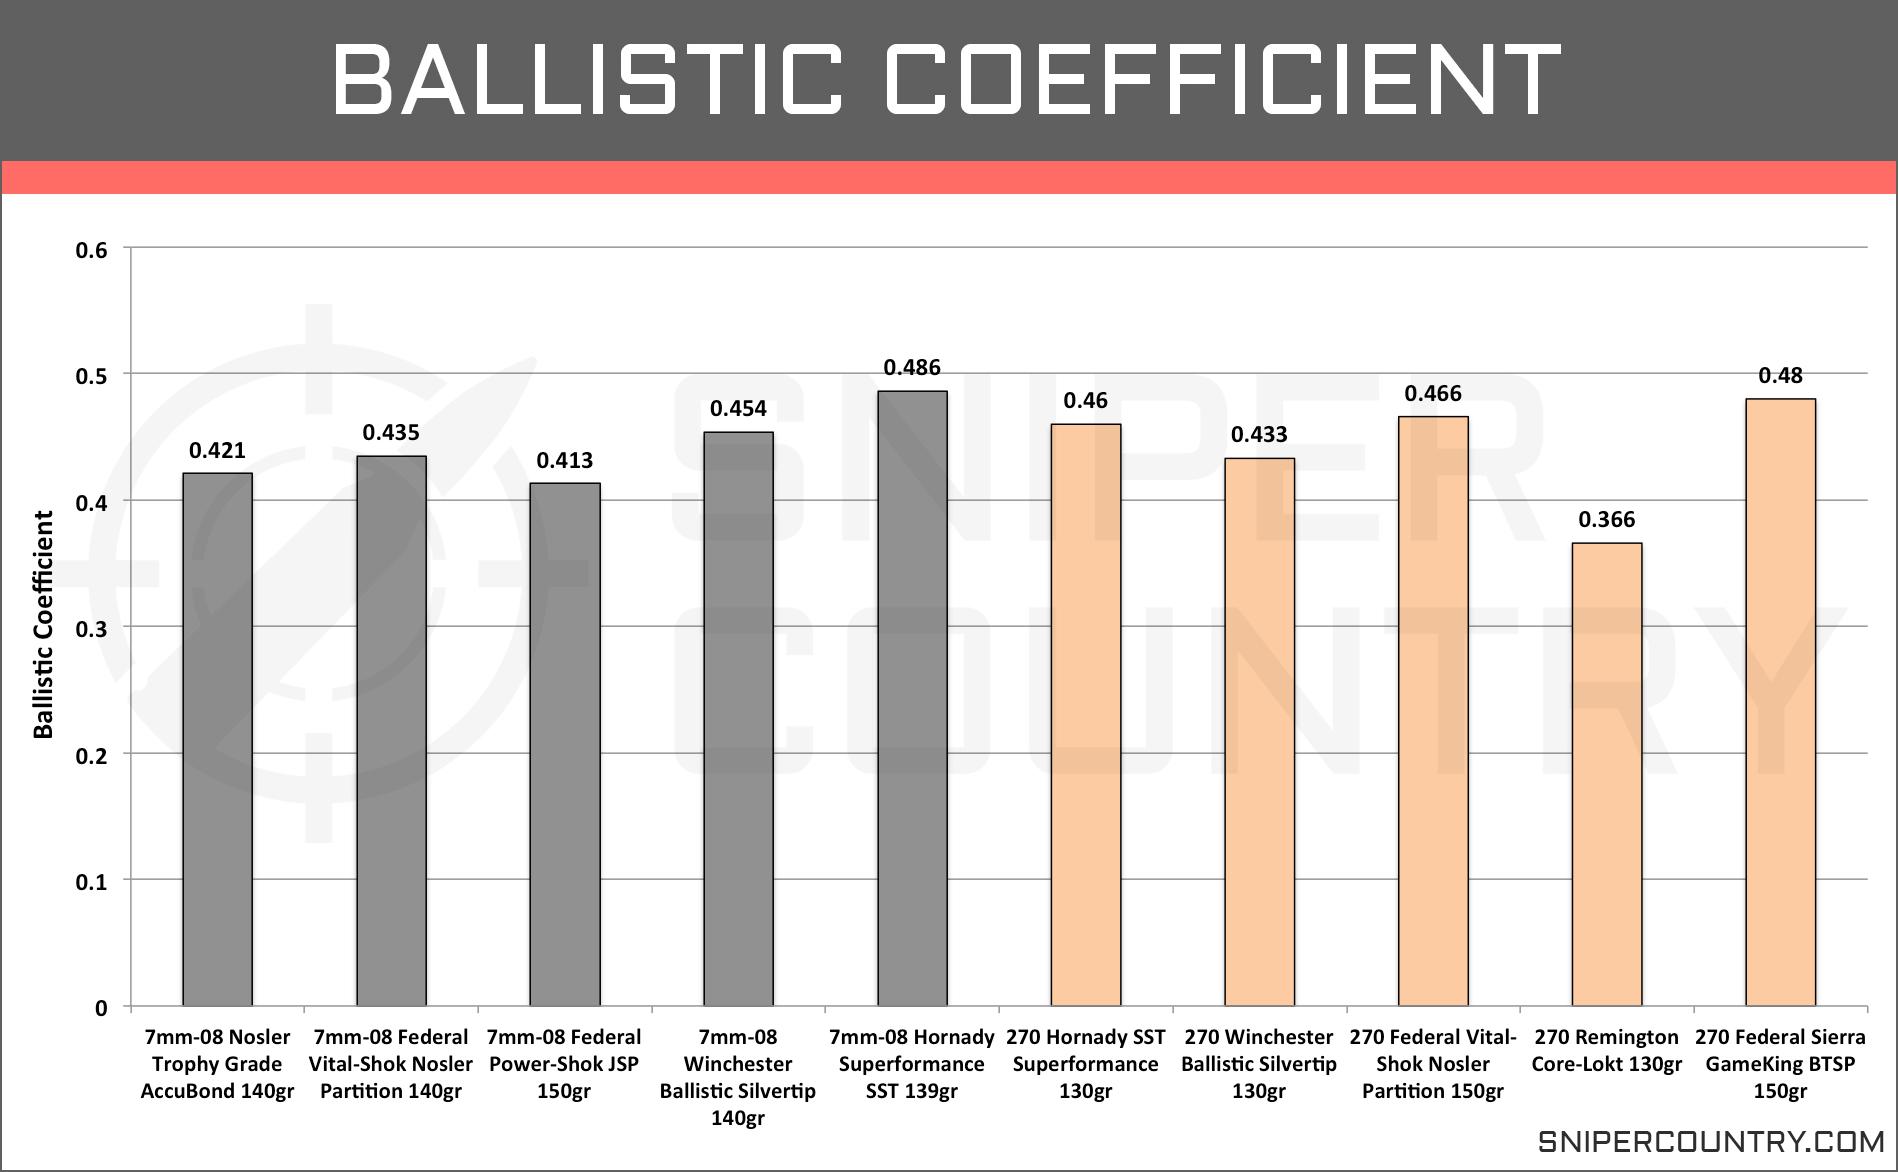 Ballistic Coefficient 7mm-08 Rem vs .270 Win